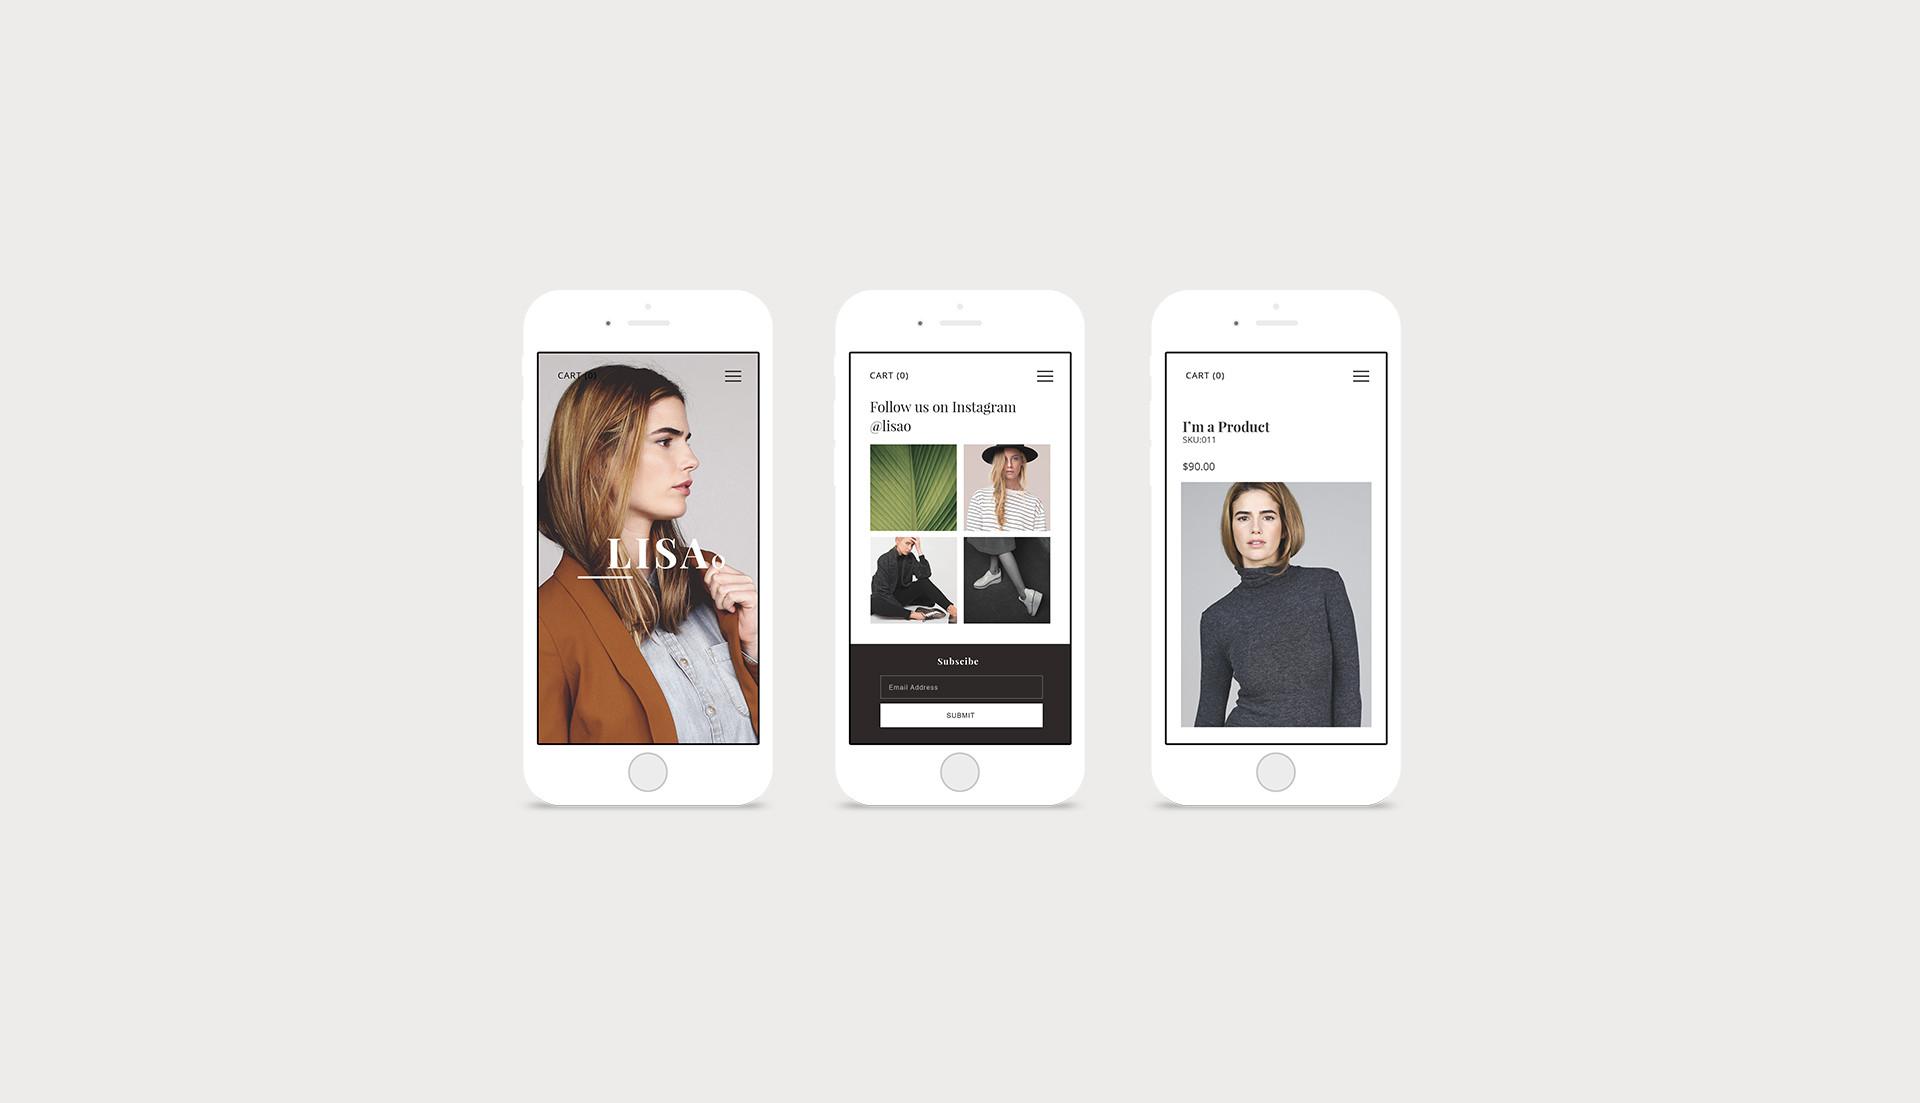 Web Design Consultation - Phone Call